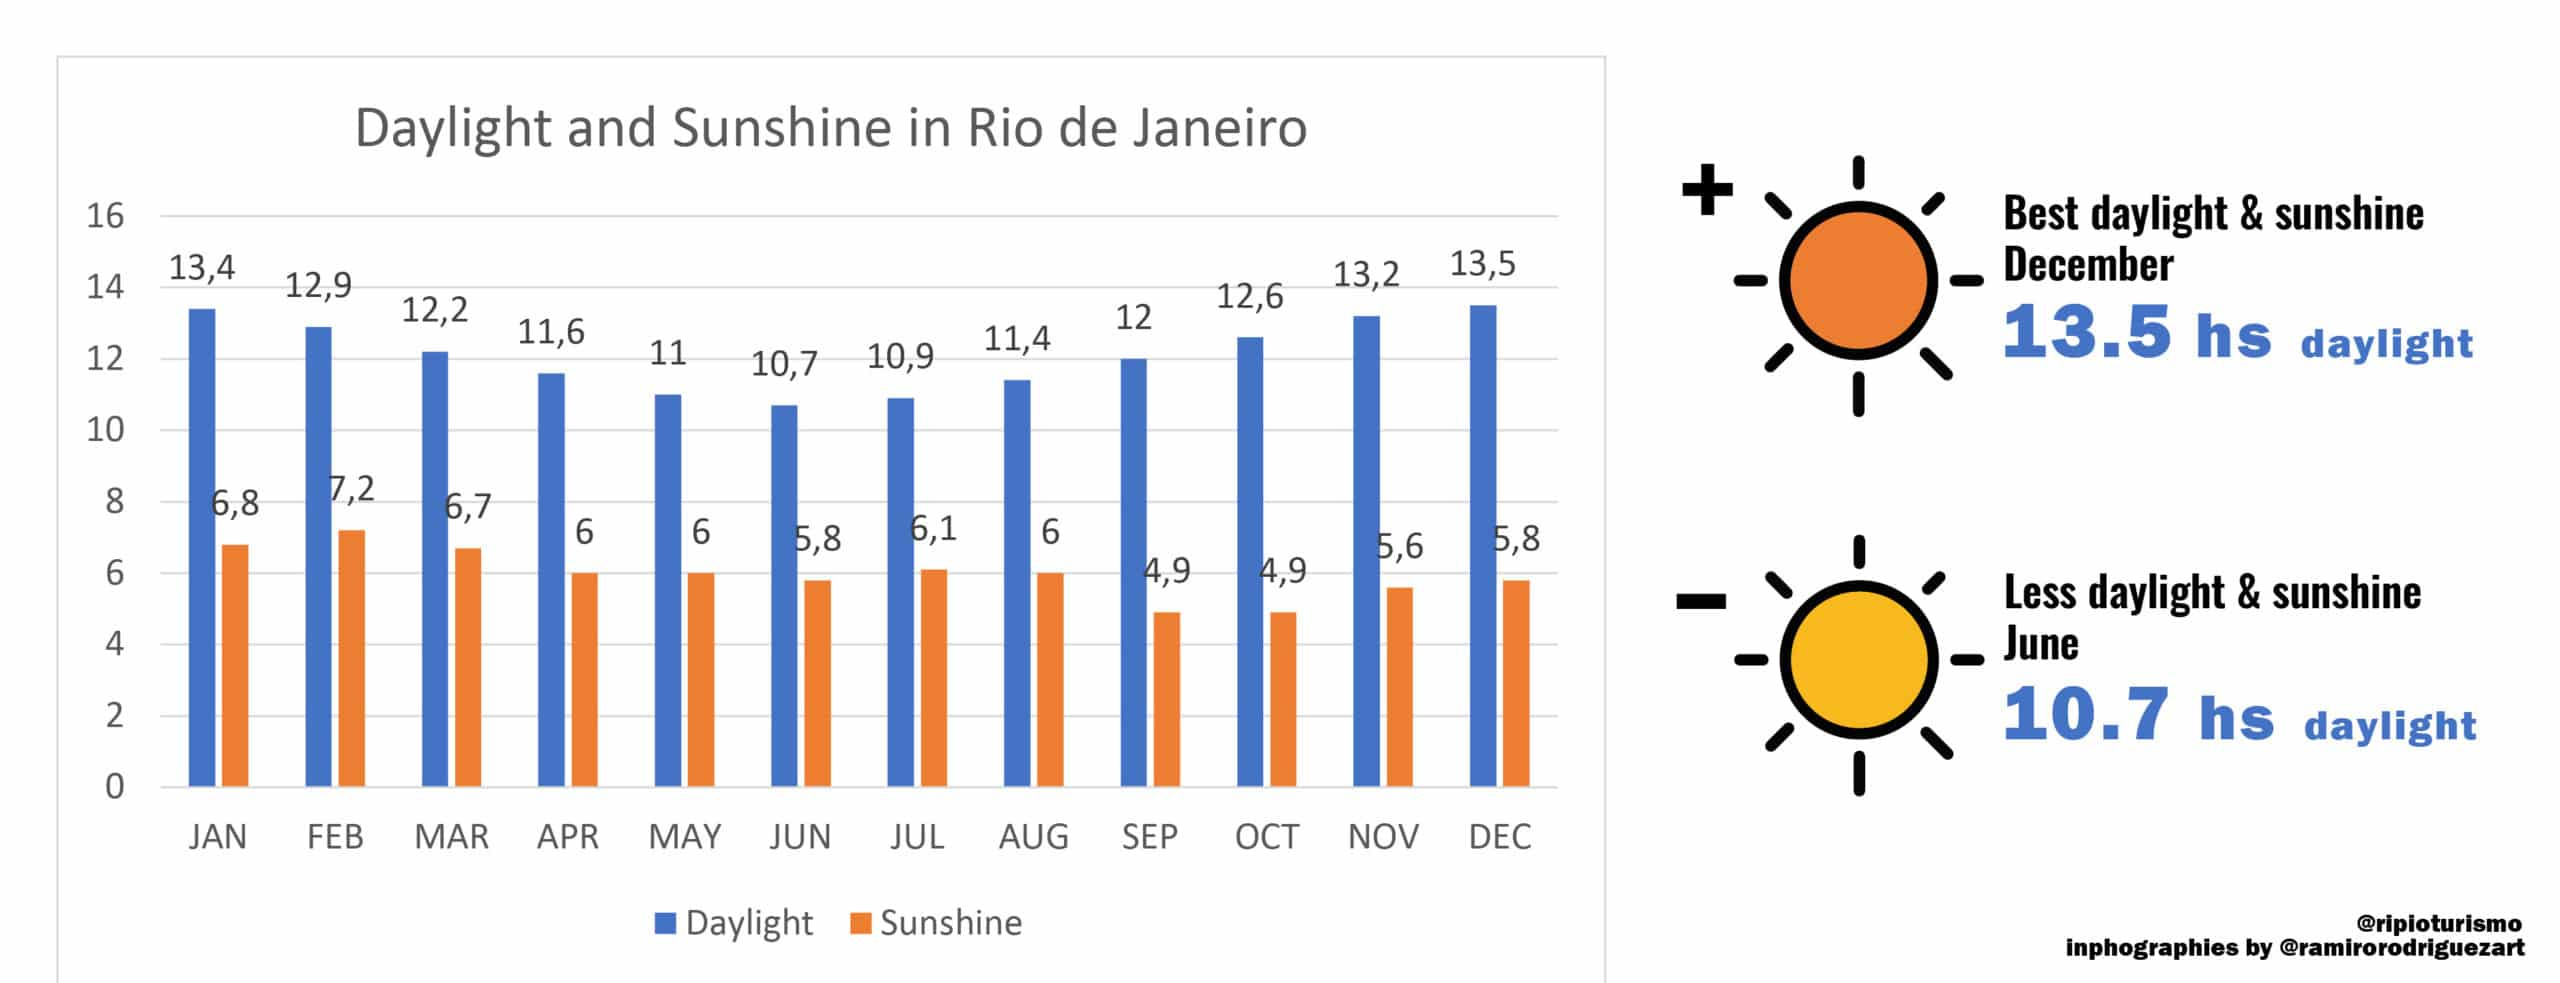 Daylight and Sunshine in Rio de Janeiro - RipioTurismo Incoming Tour Operator Brazil